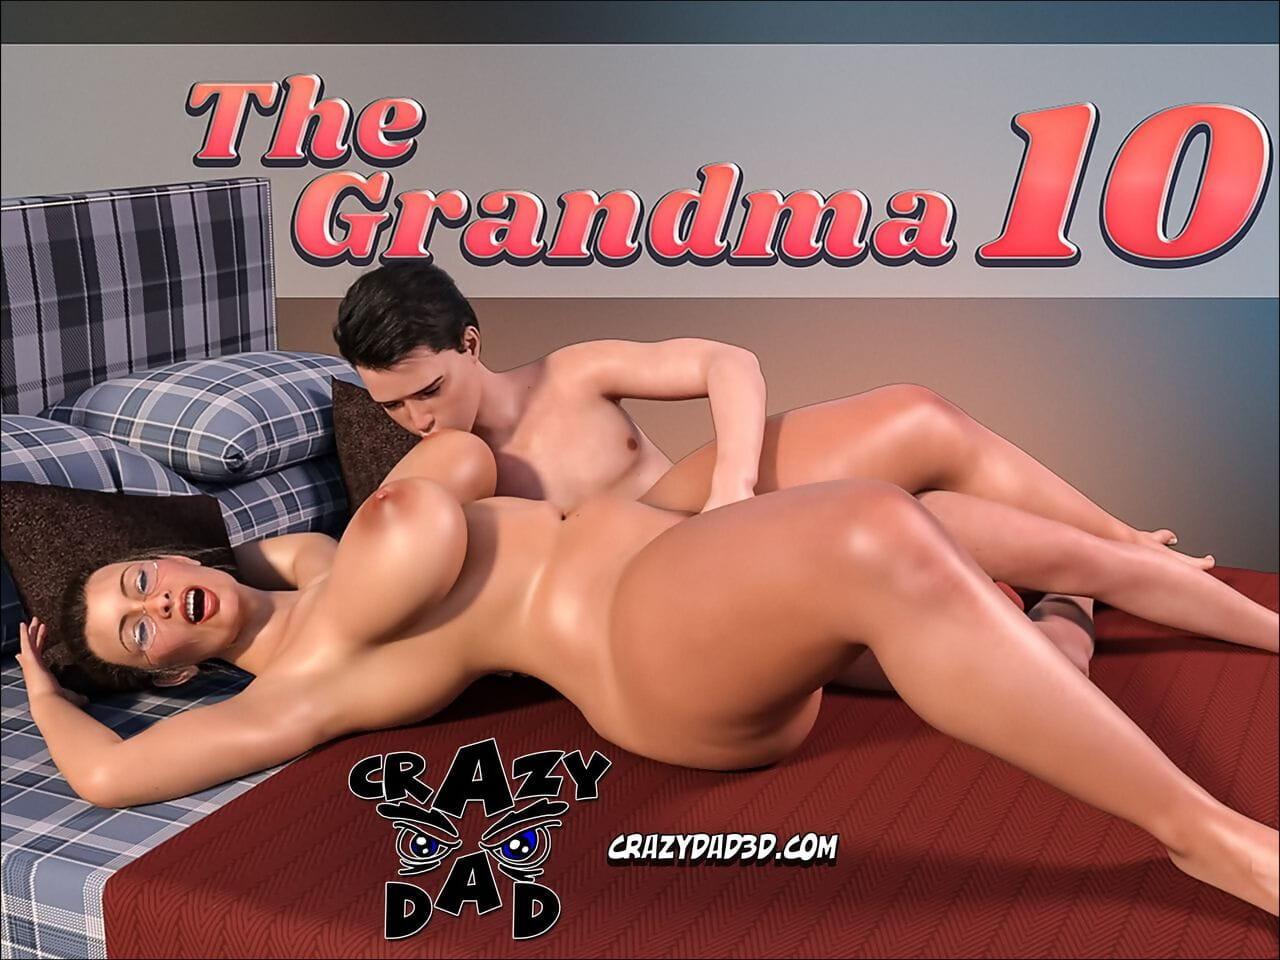 Moronic Procreate 3D Chum around with annoy Grandma 10 English